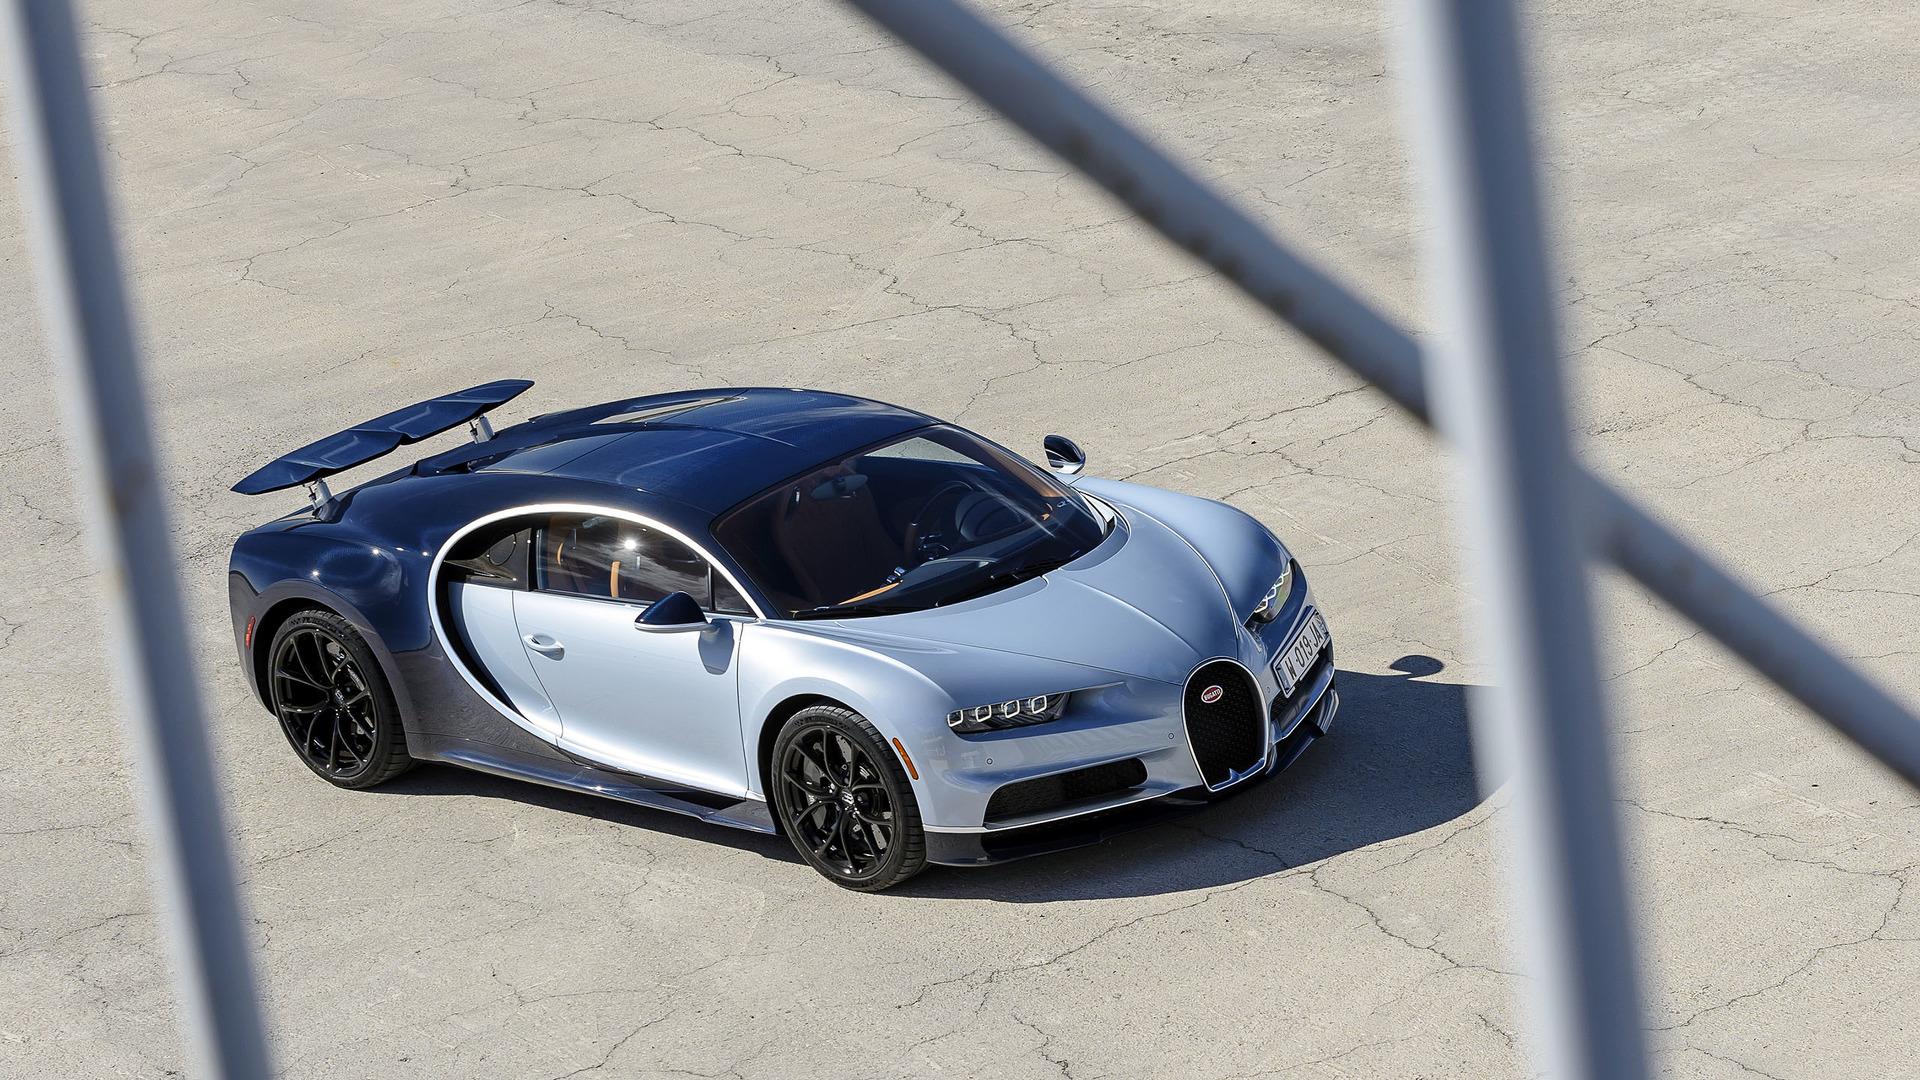 FormaCar: Rumor: All-electric Bugatti SUV coming at last